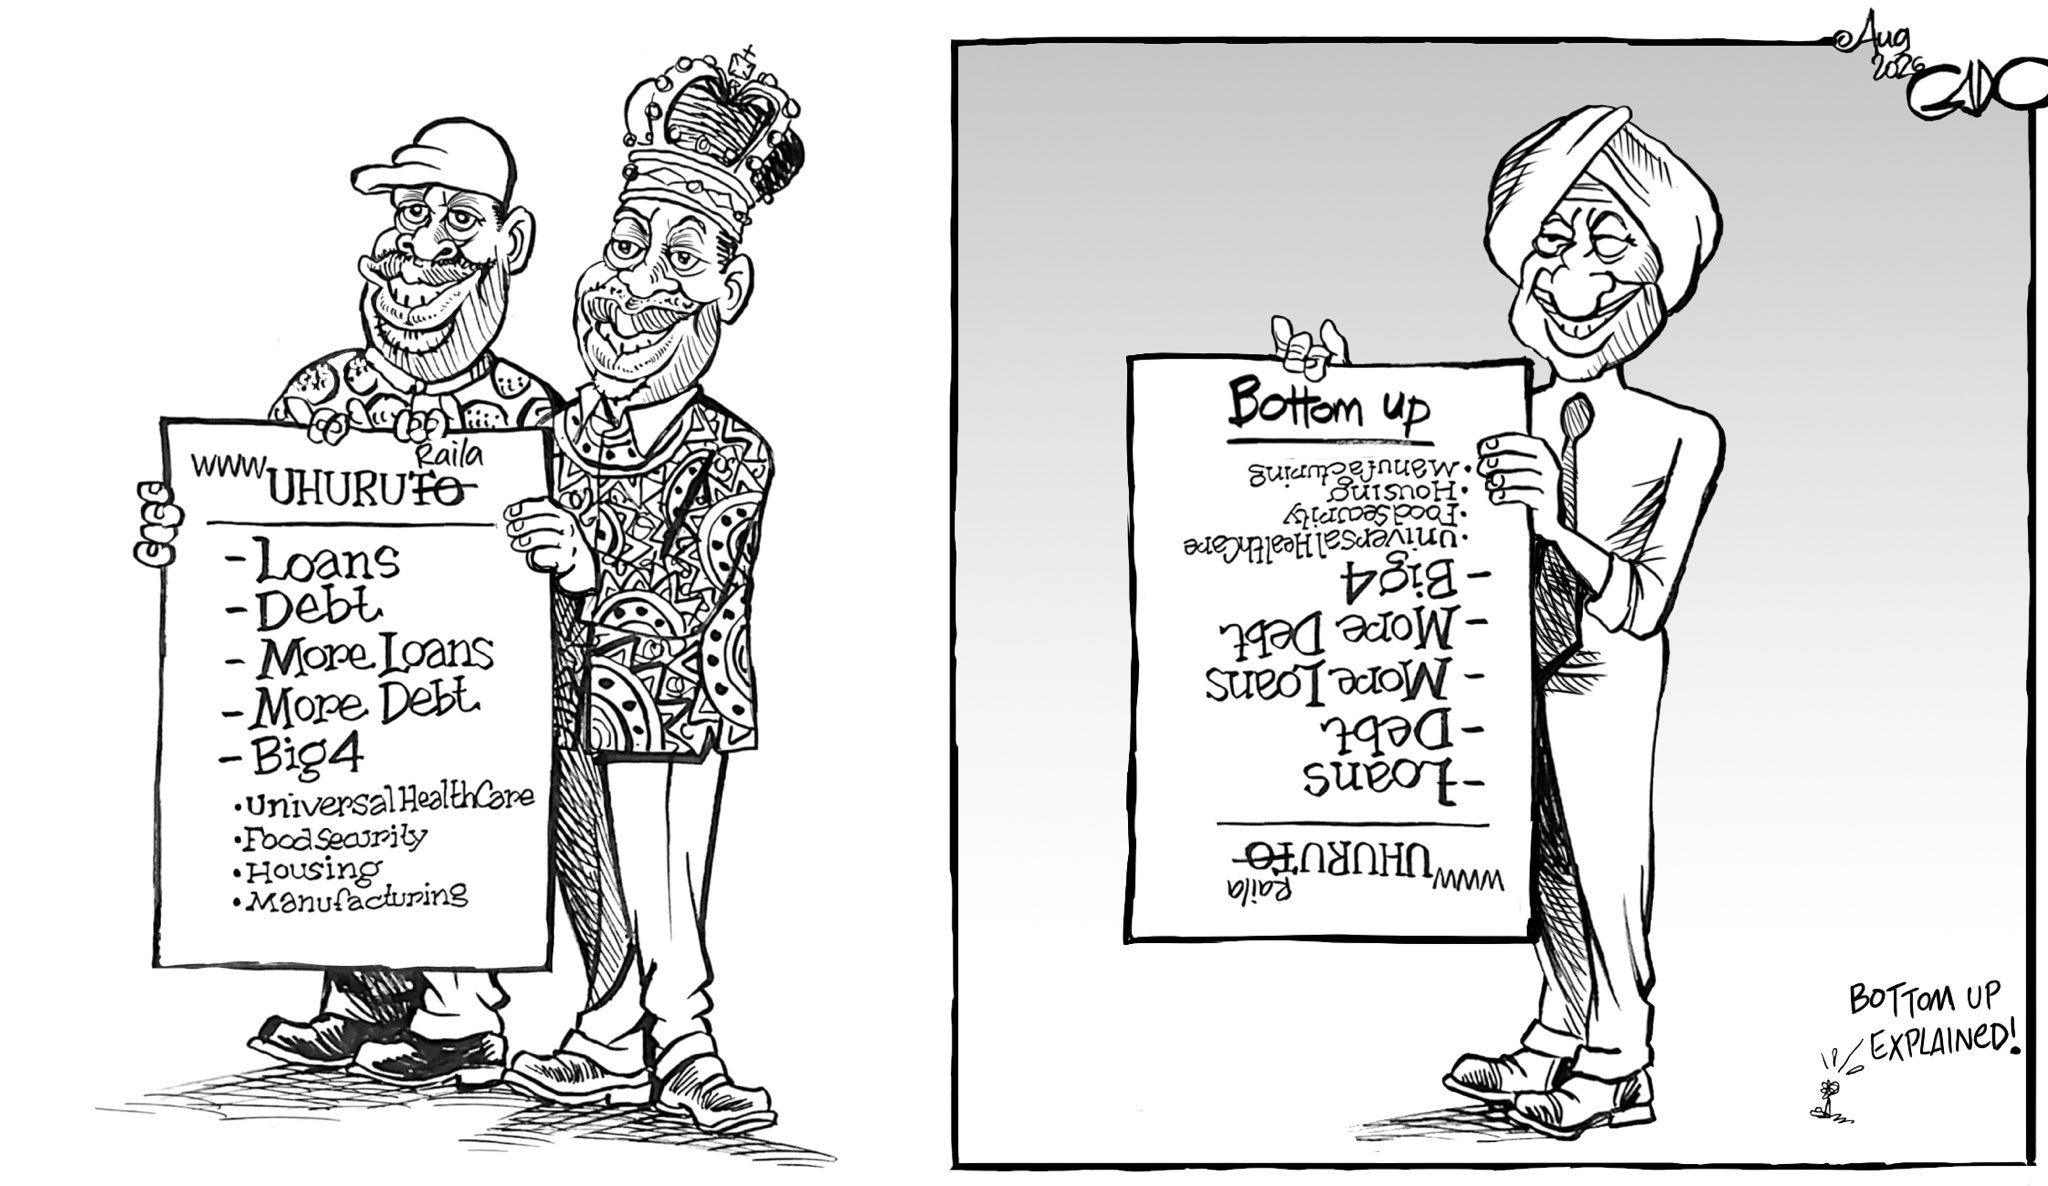 "Gado Cartoons on Twitter: ""Bottom Up explained!… """